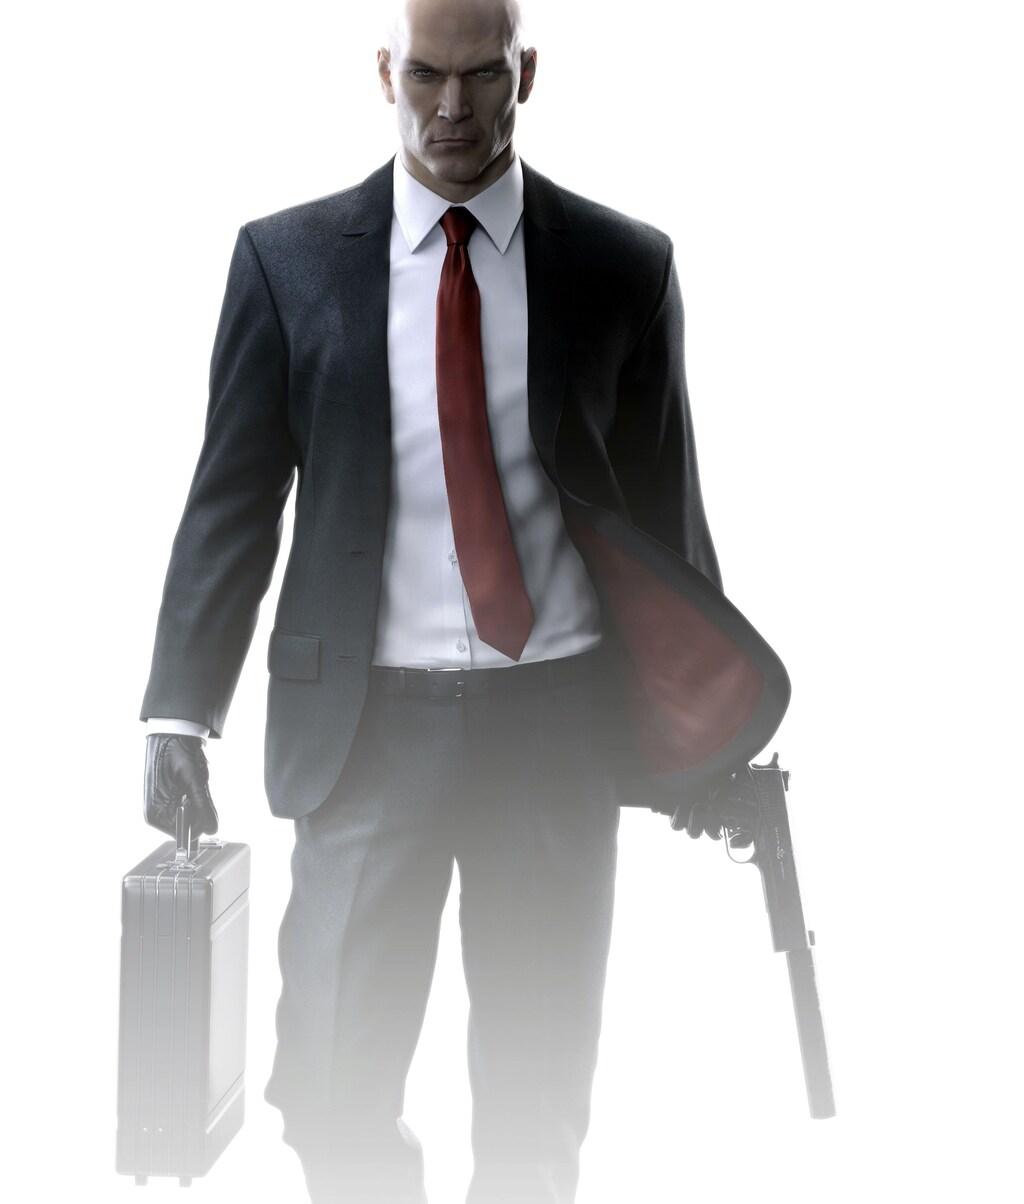 Hitman Wallpaper: Download Hitman Agent 47 Game HD Wallpaper In 1024x1204